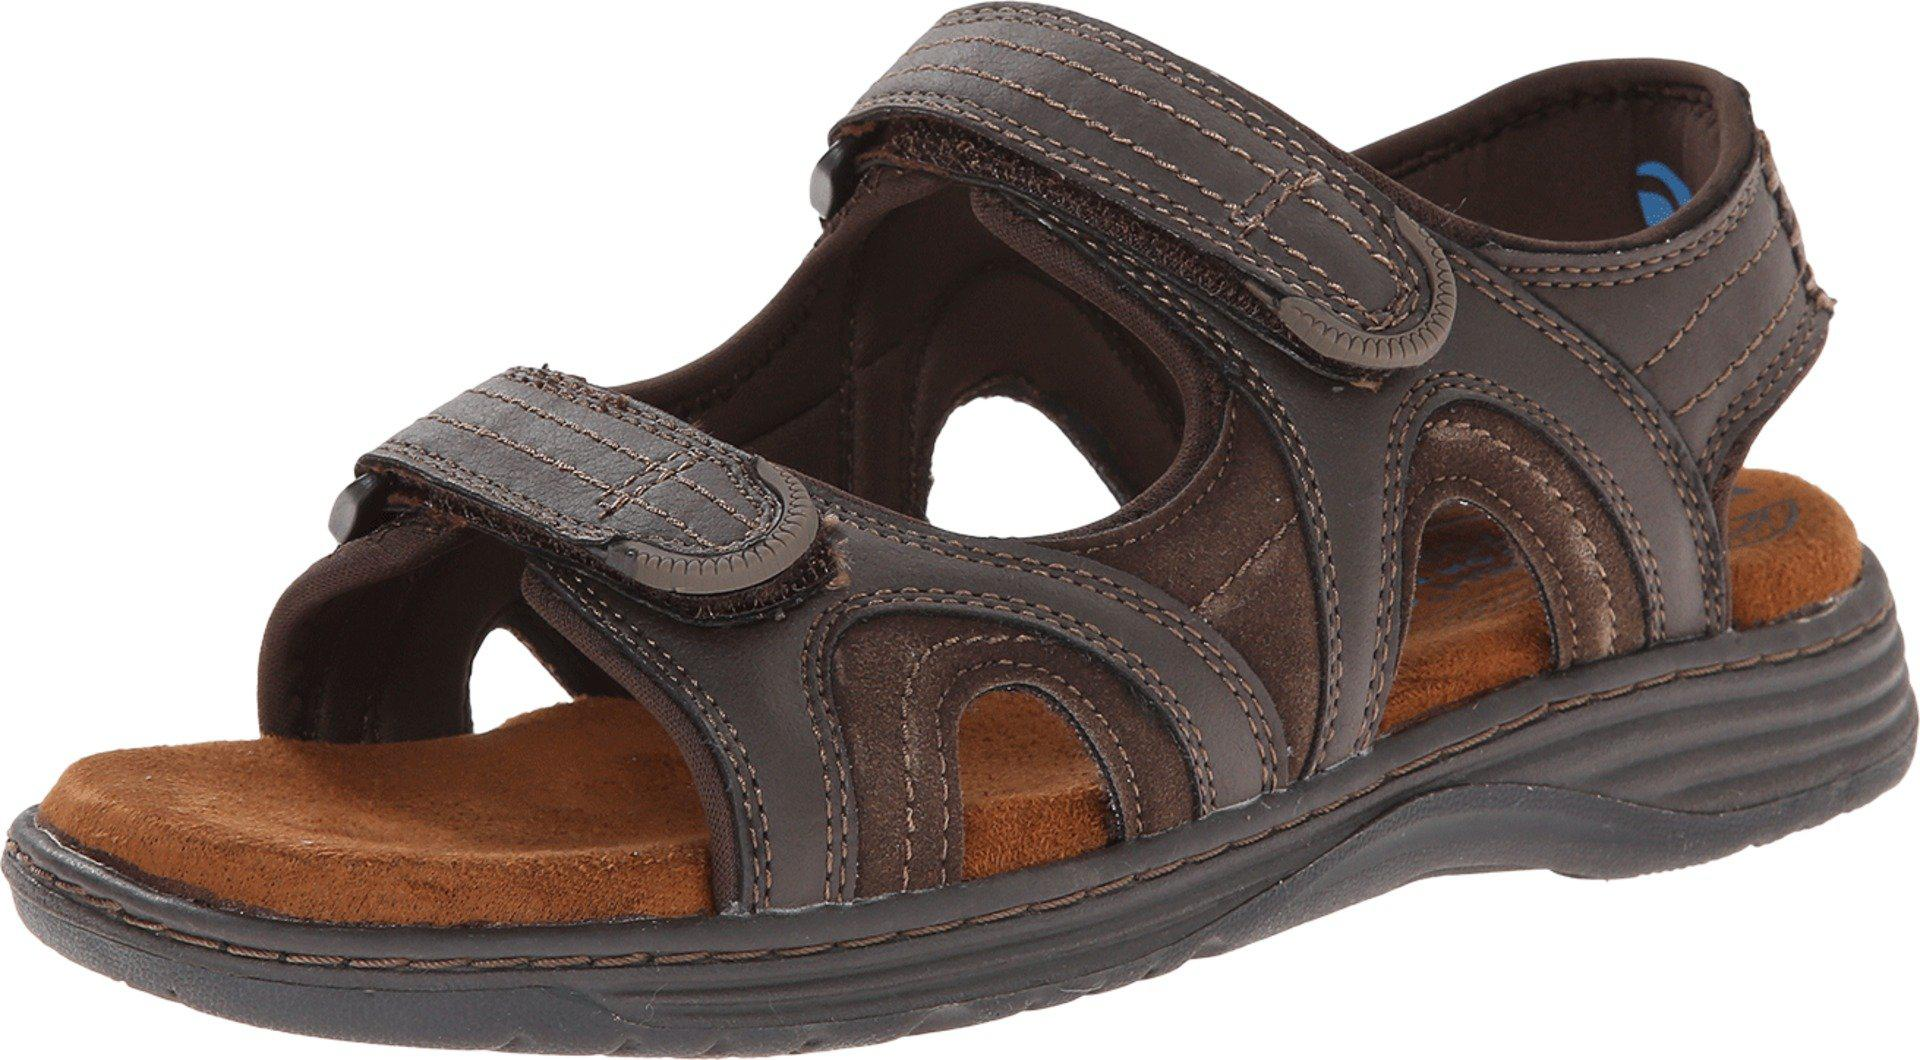 Lyst Nunn Bush Randall Two Strap Sandal In Brown For Men